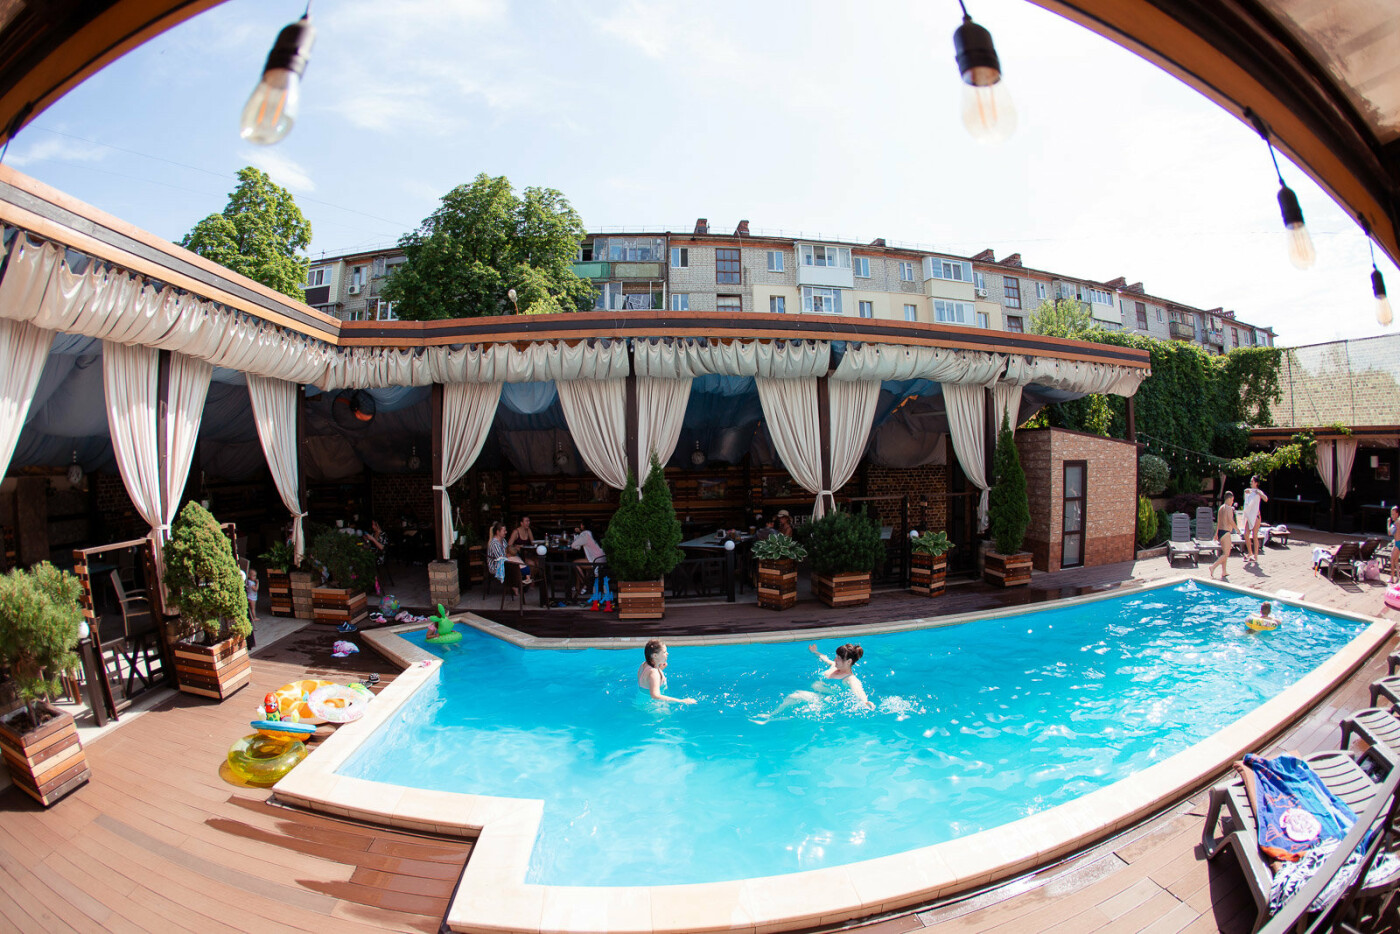 Заведения с летними террасами в Харькове, фото-93